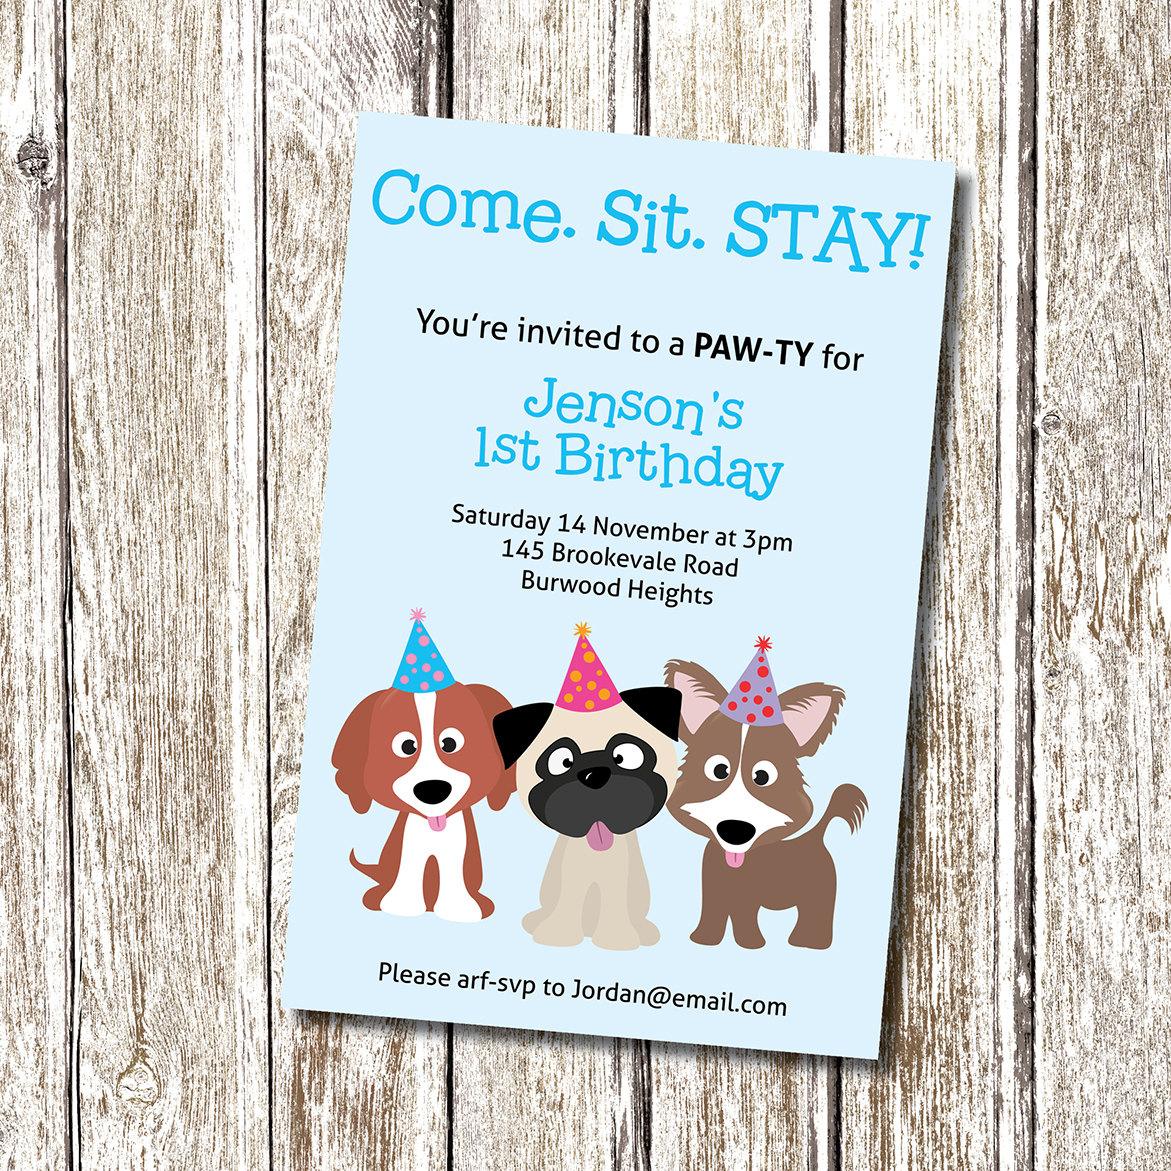 Puppy Dog Party Free Printable Invitations Edbd B C Ecc Luxury Puppy - Dog Birthday Invitations Free Printable